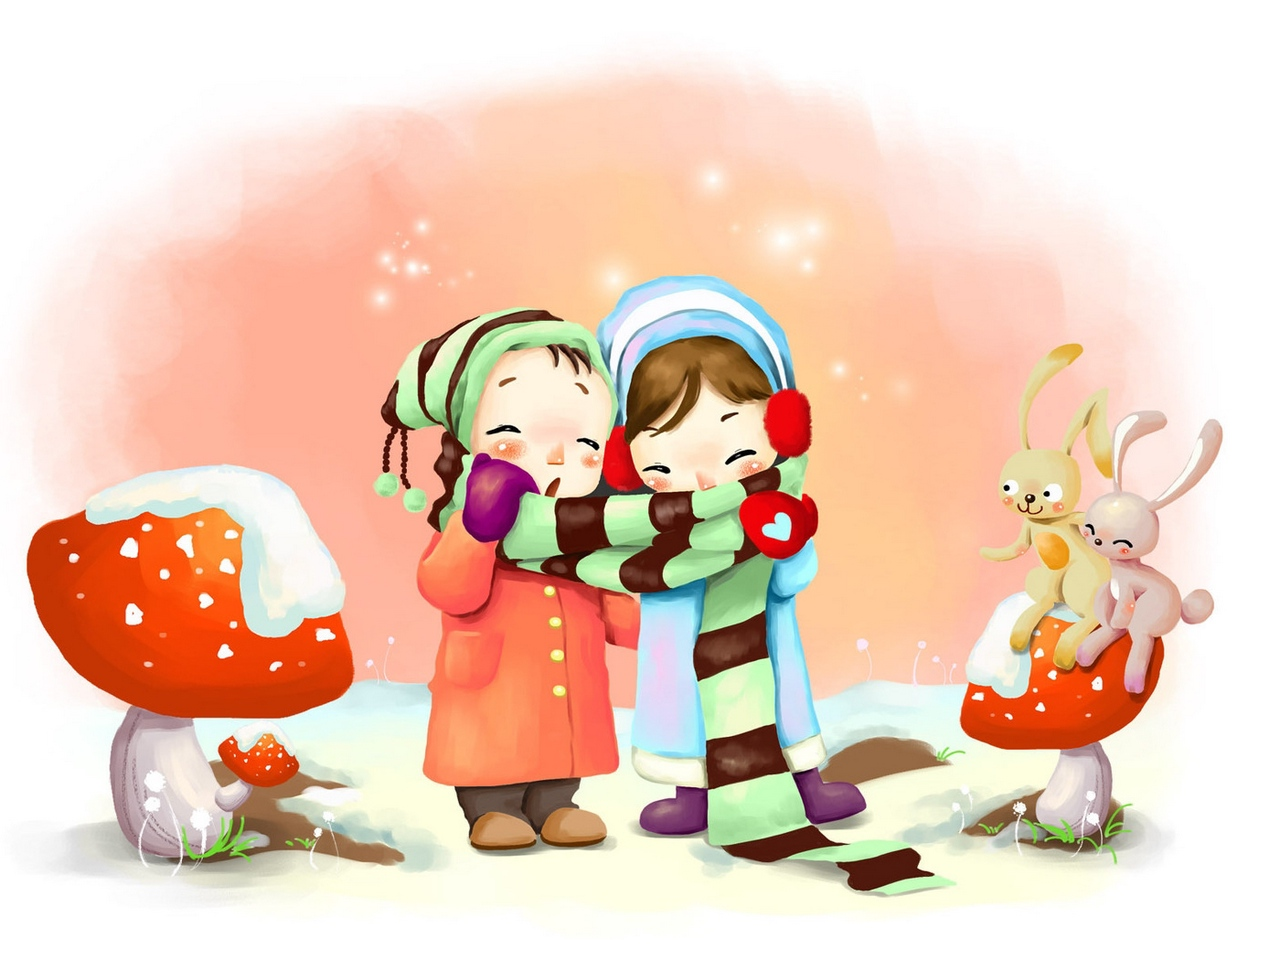 1280x960 Download Wallpaper Drawing, Winter, Kids, Breath